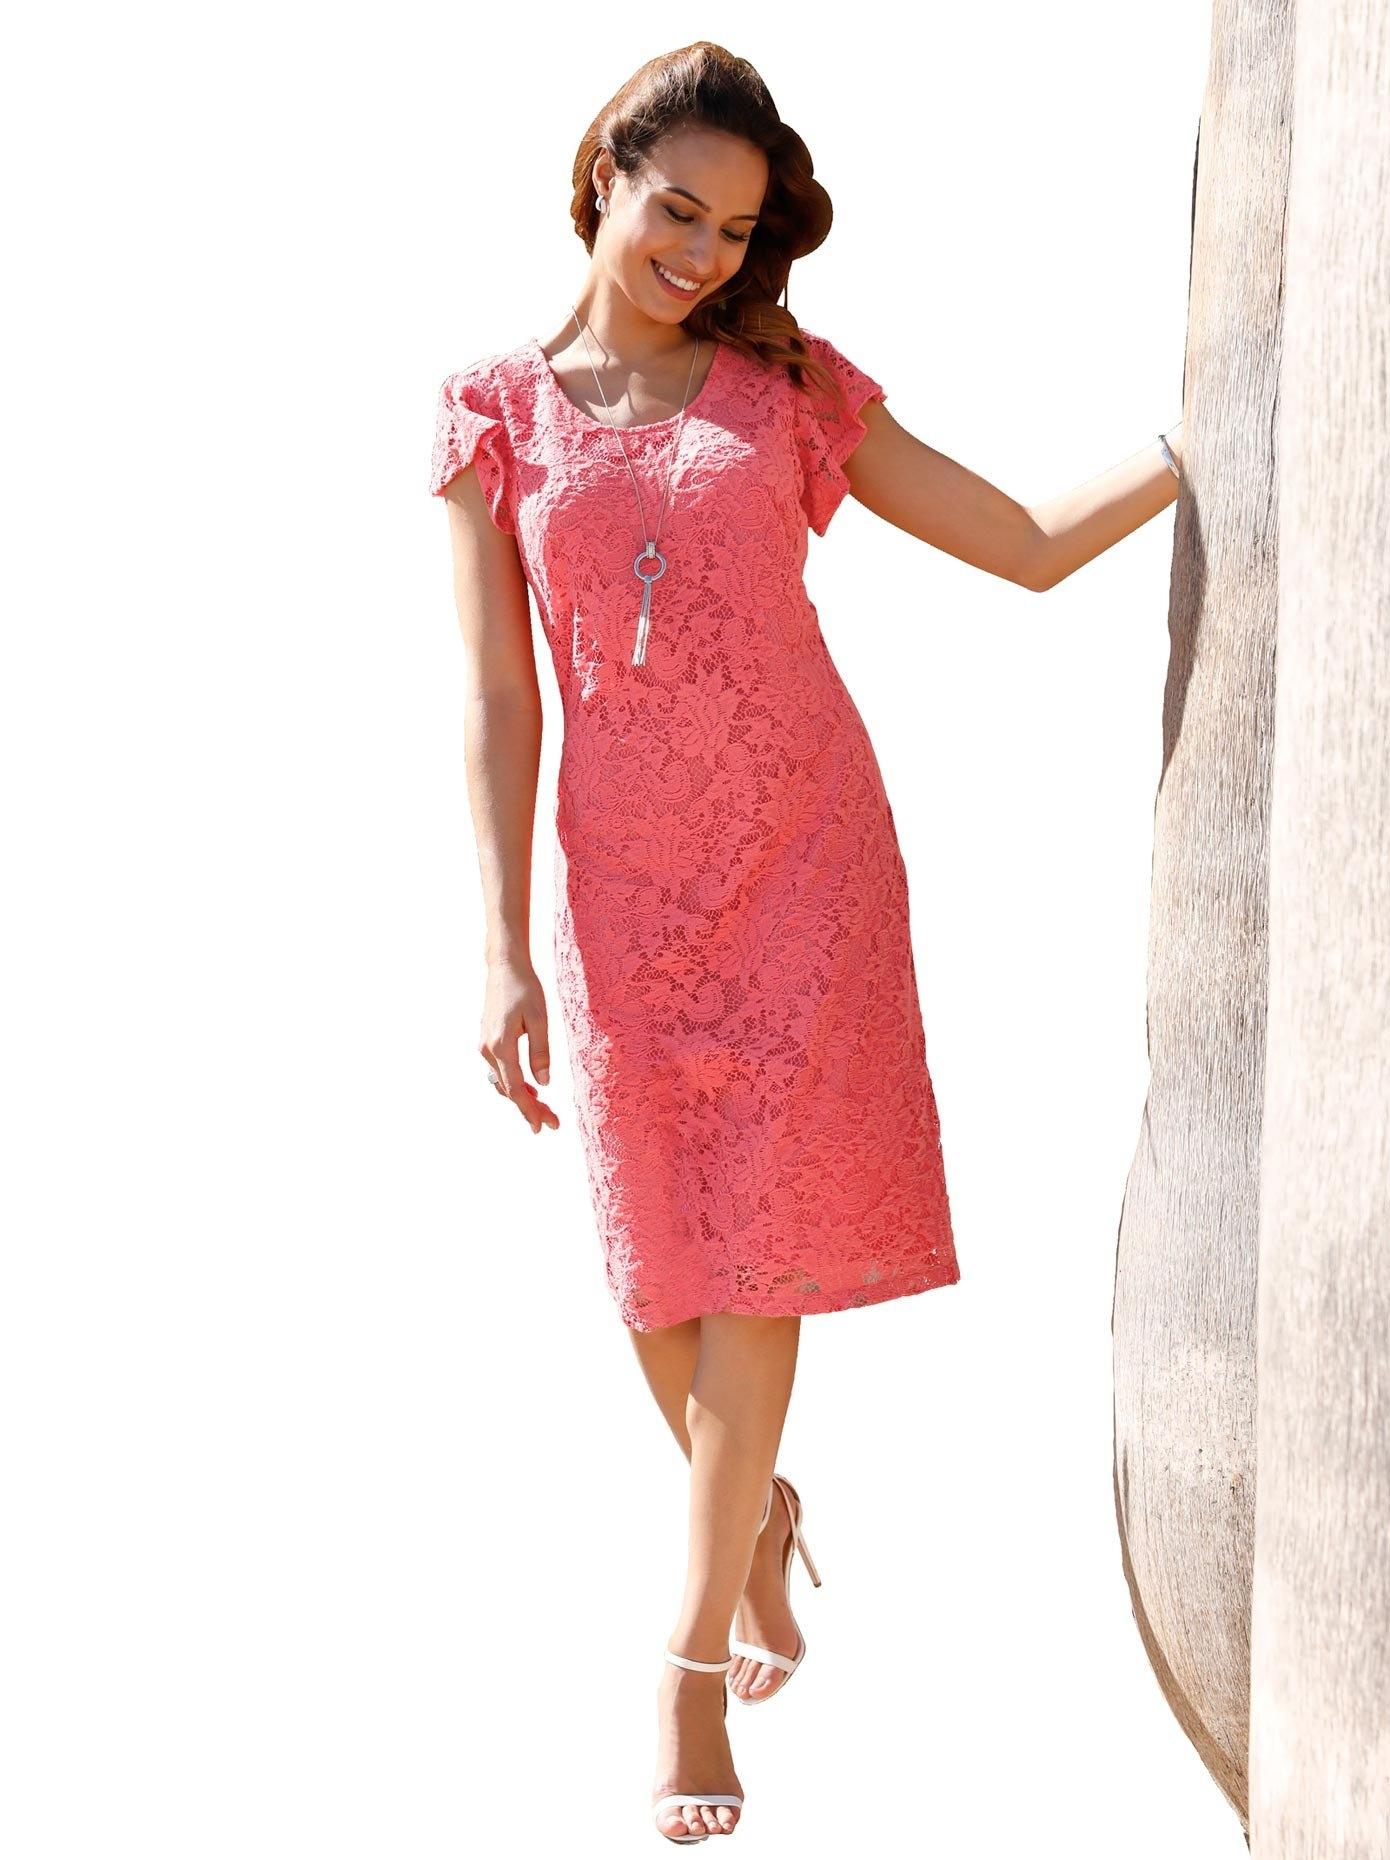 Lady kanten jurk Jurk nu online bestellen